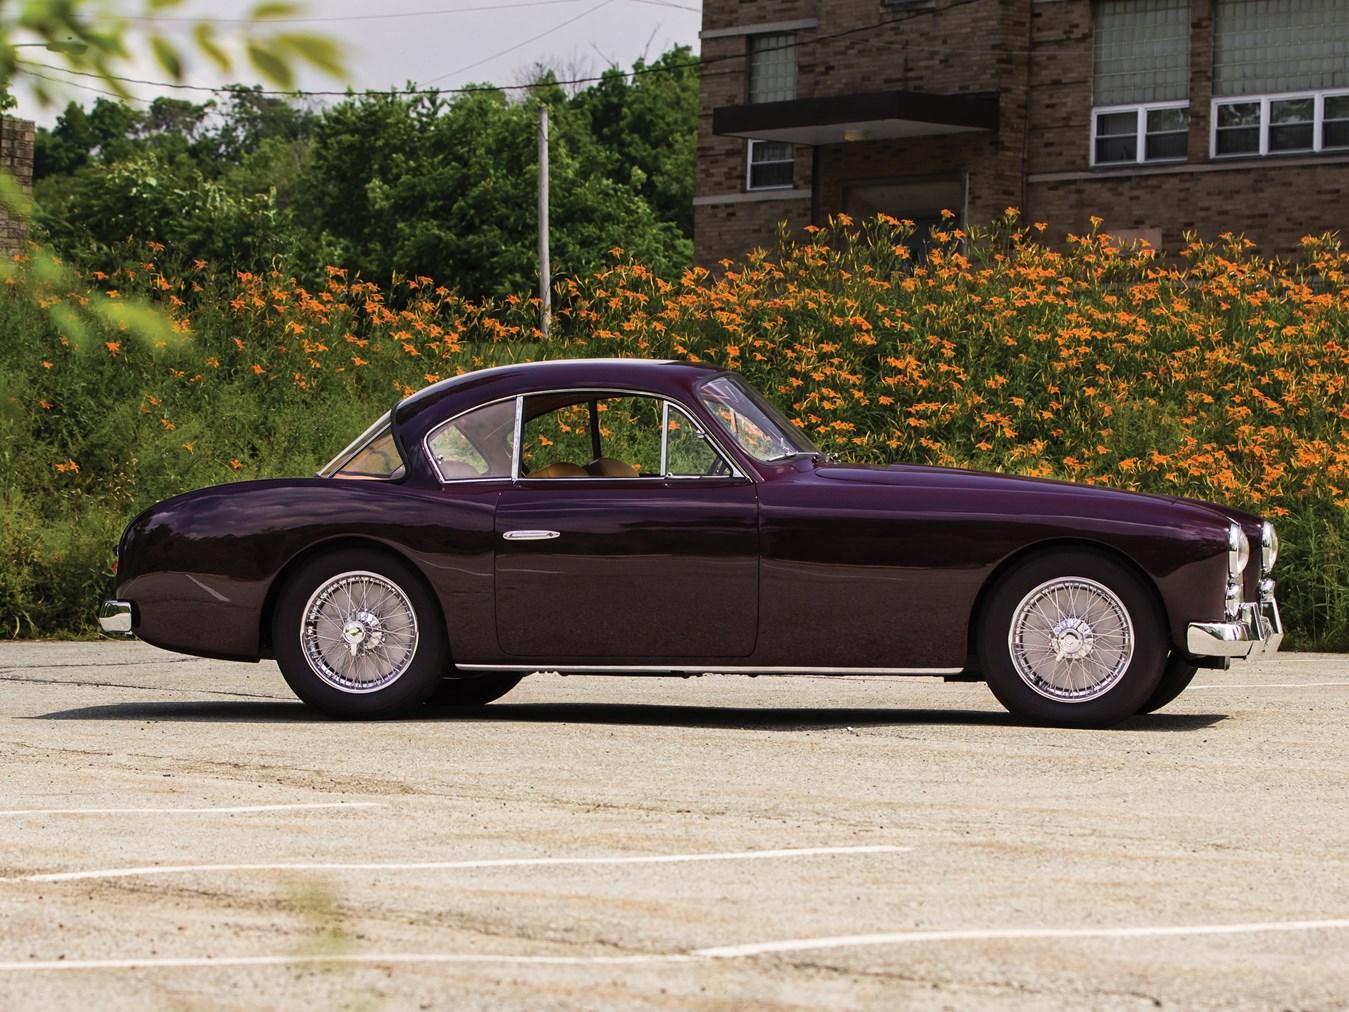 1954 Talbot-Lago T26 GSL